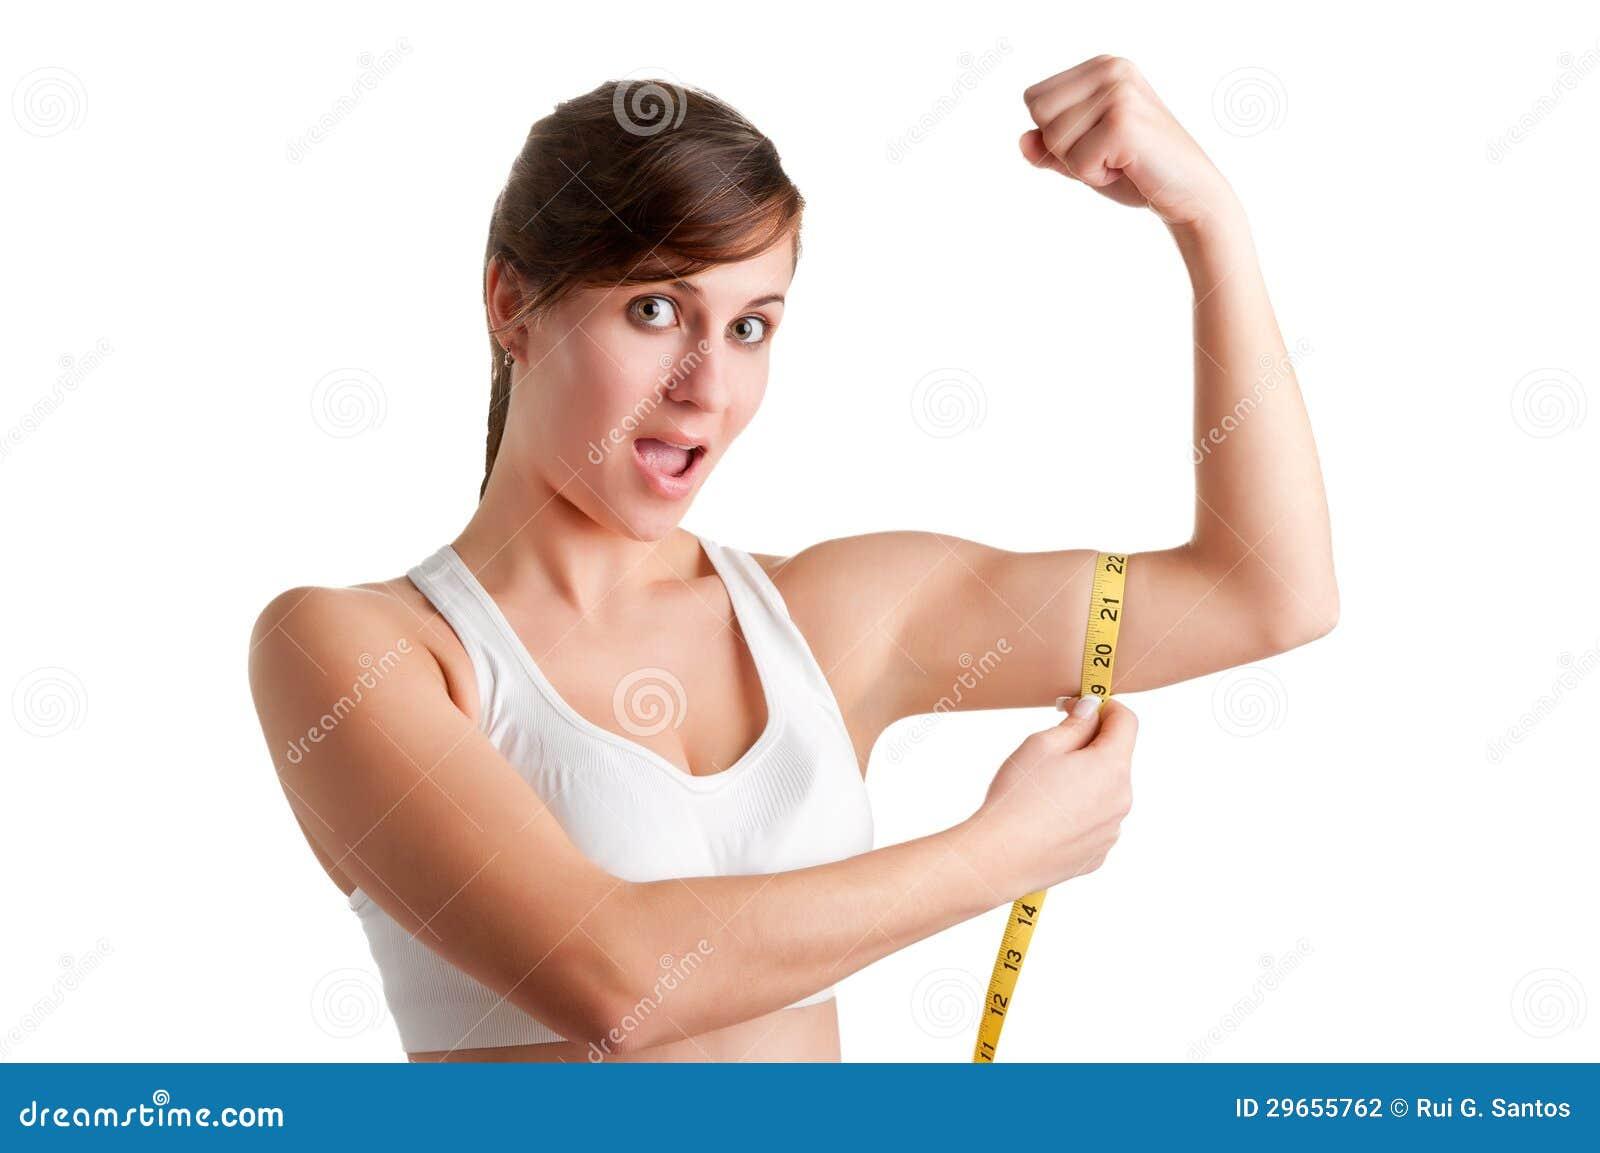 shocked woman measuring her biceps stock photography image 29655762. Black Bedroom Furniture Sets. Home Design Ideas